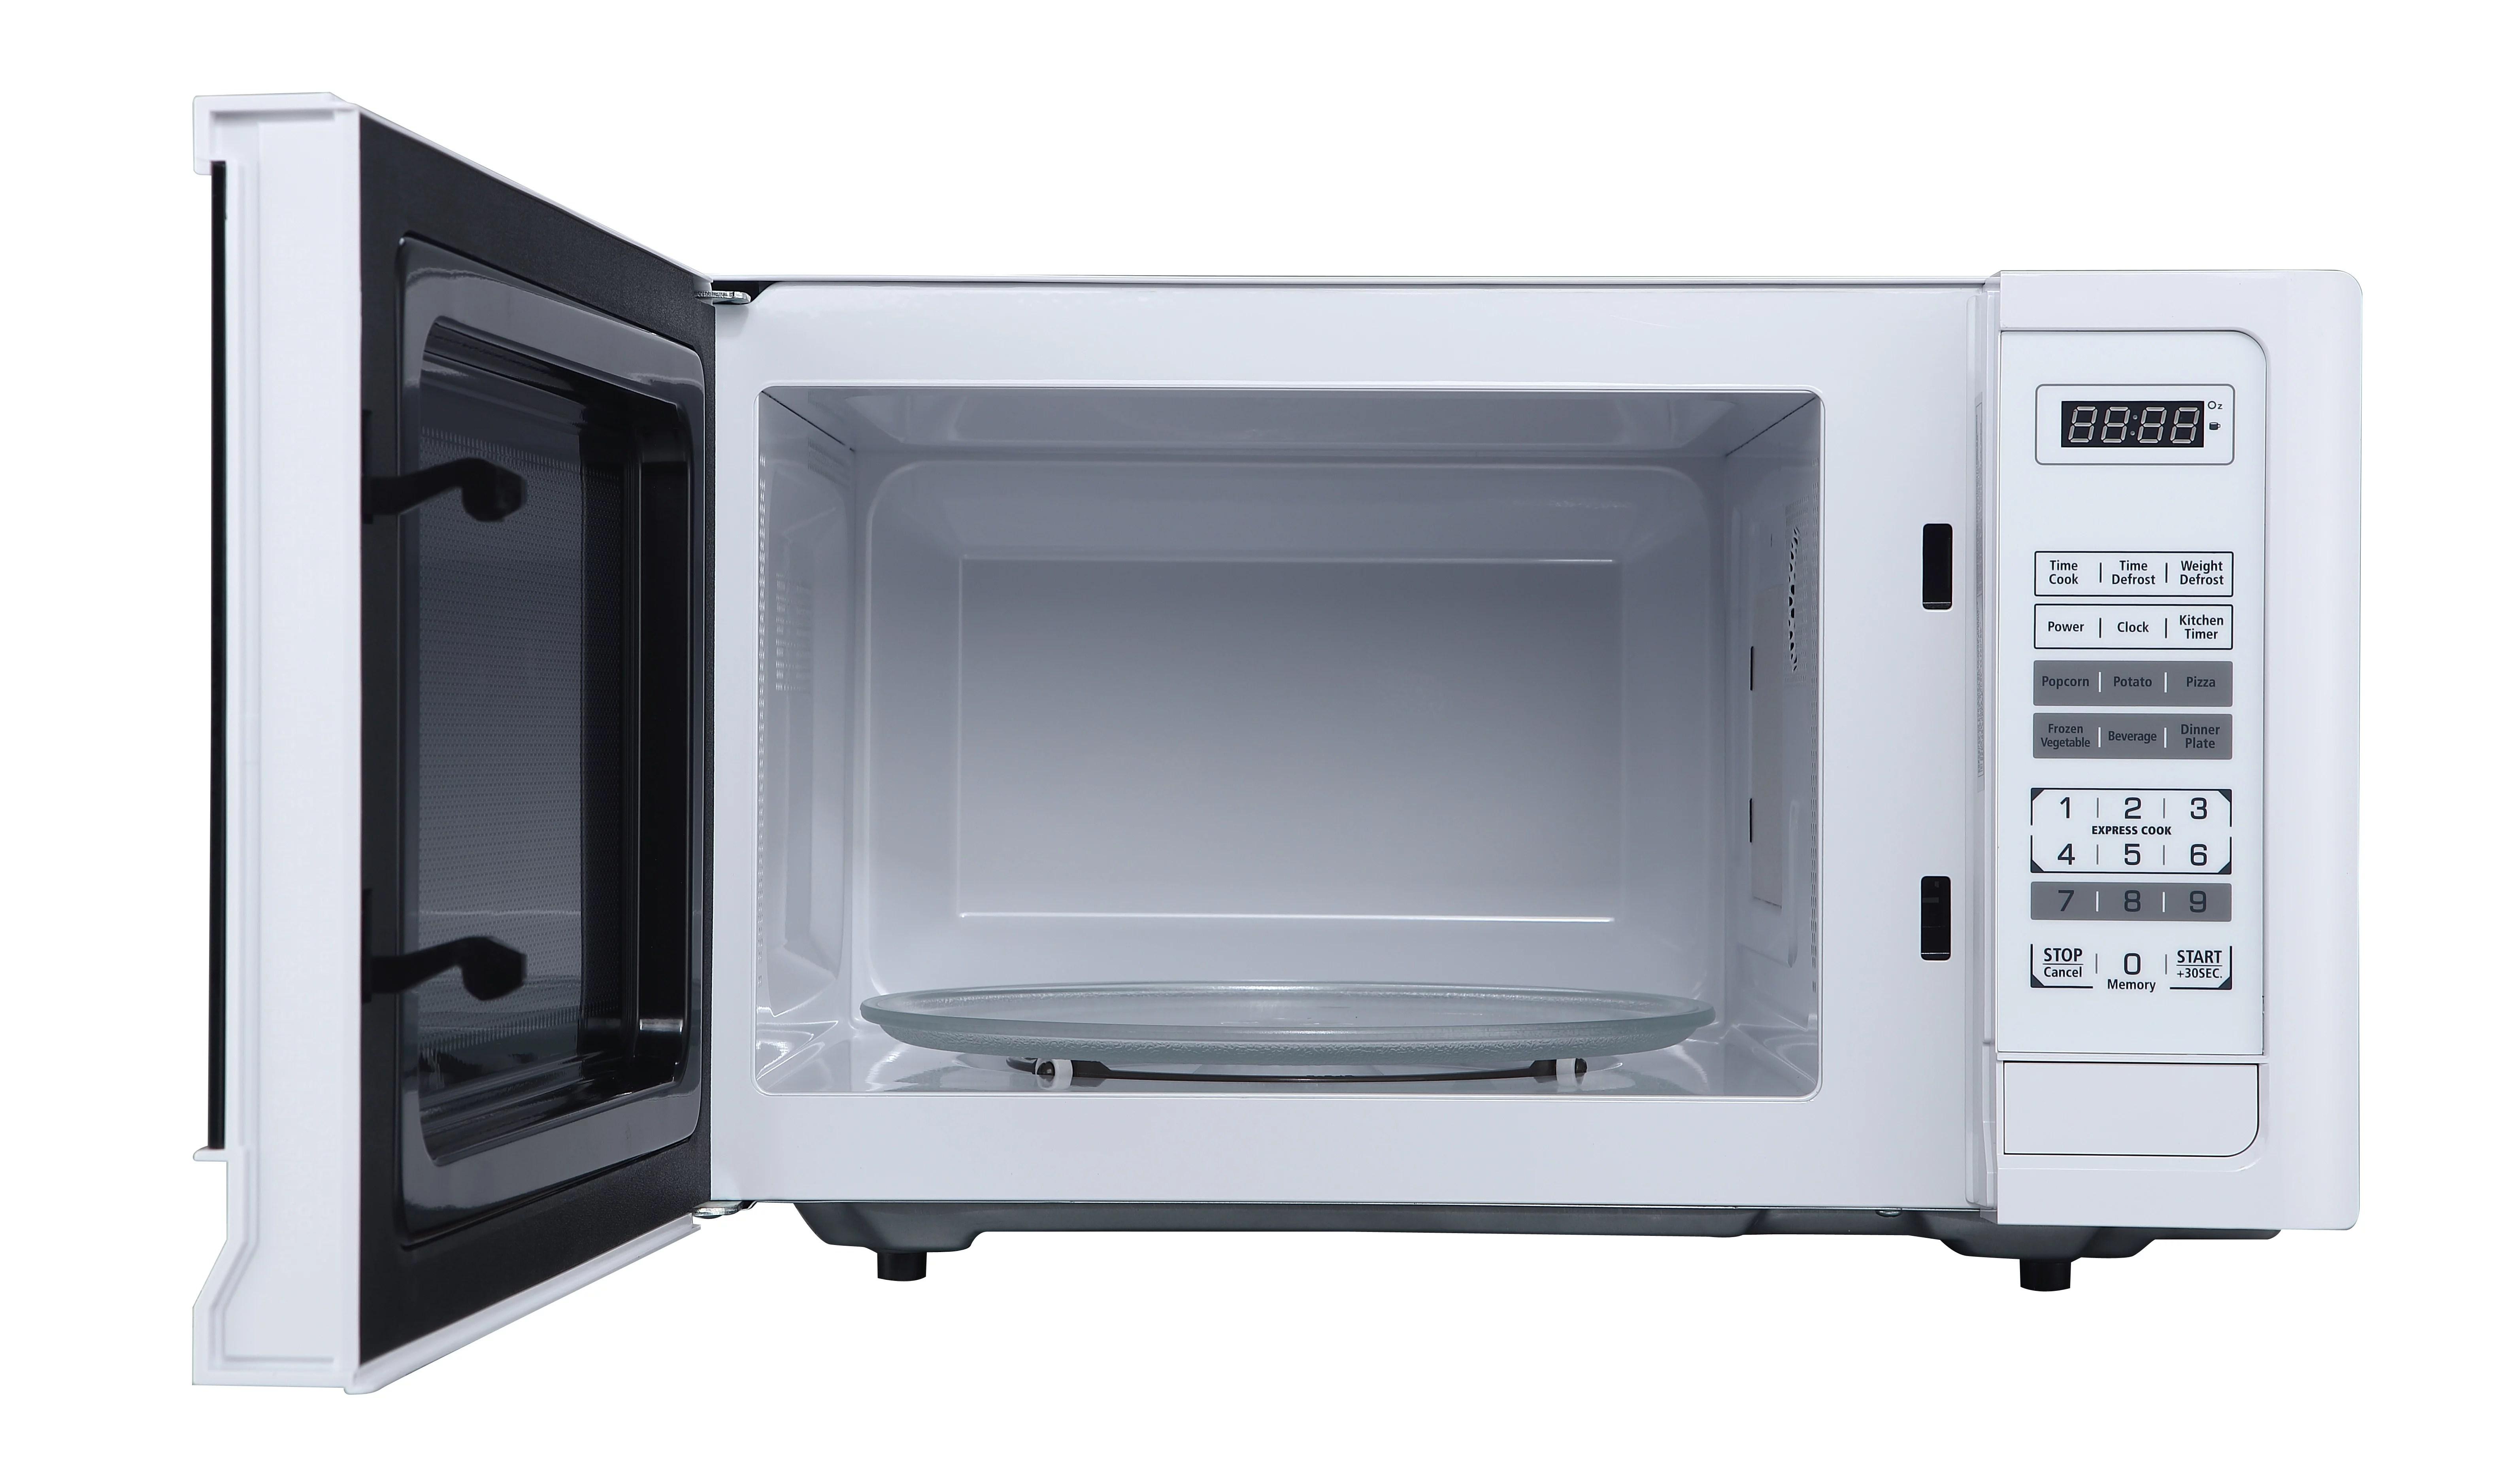 speed cooking microwave ovens ft black decker em925afo p1 0 9 cu digital microwave kitchen dining